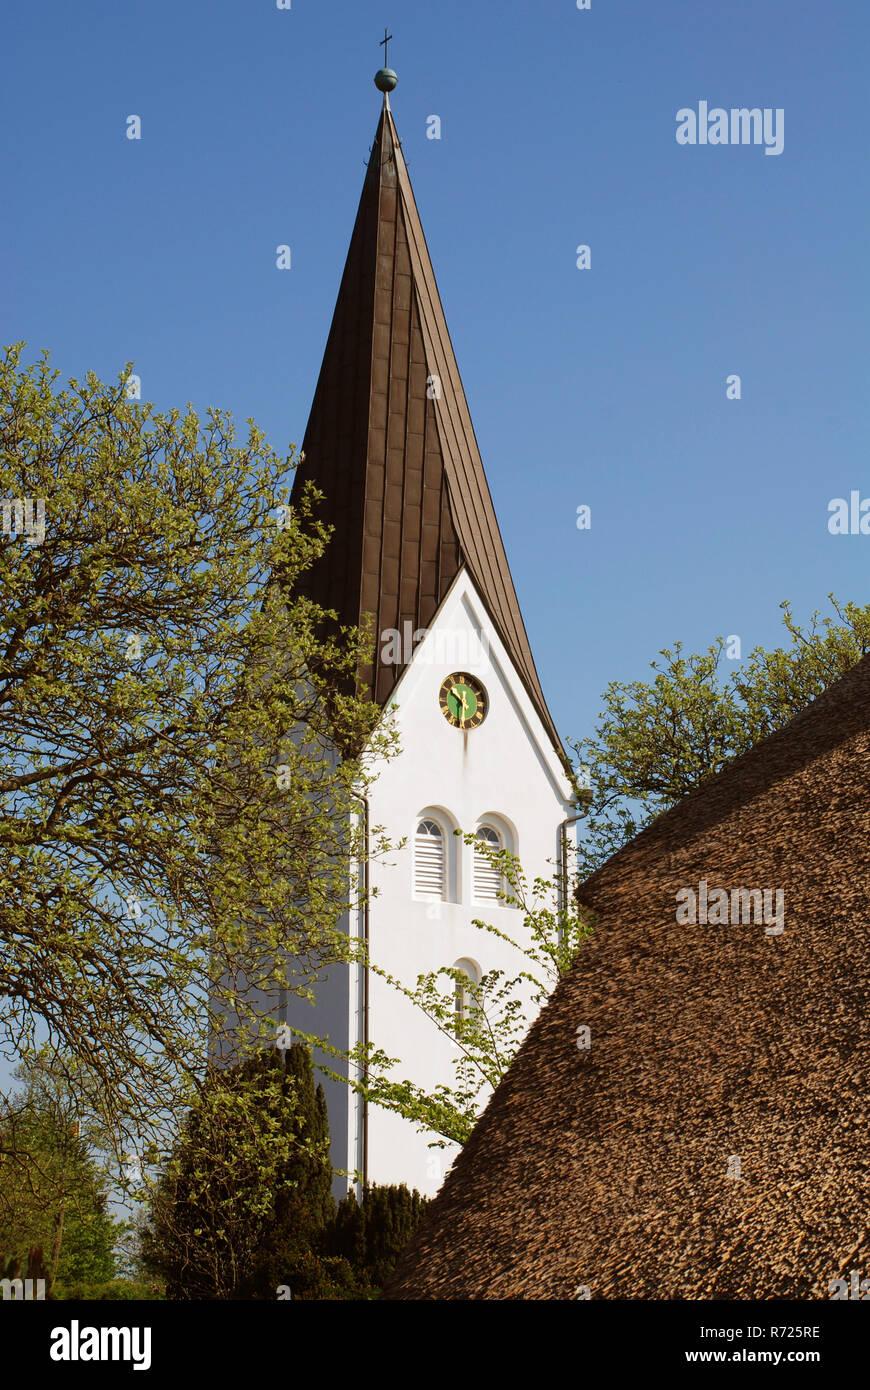 The church of St. Clement , Nebel, Amrum island, Germany. Amrum's largest village, Nebel, is located near the eastern coastline - Stock Image